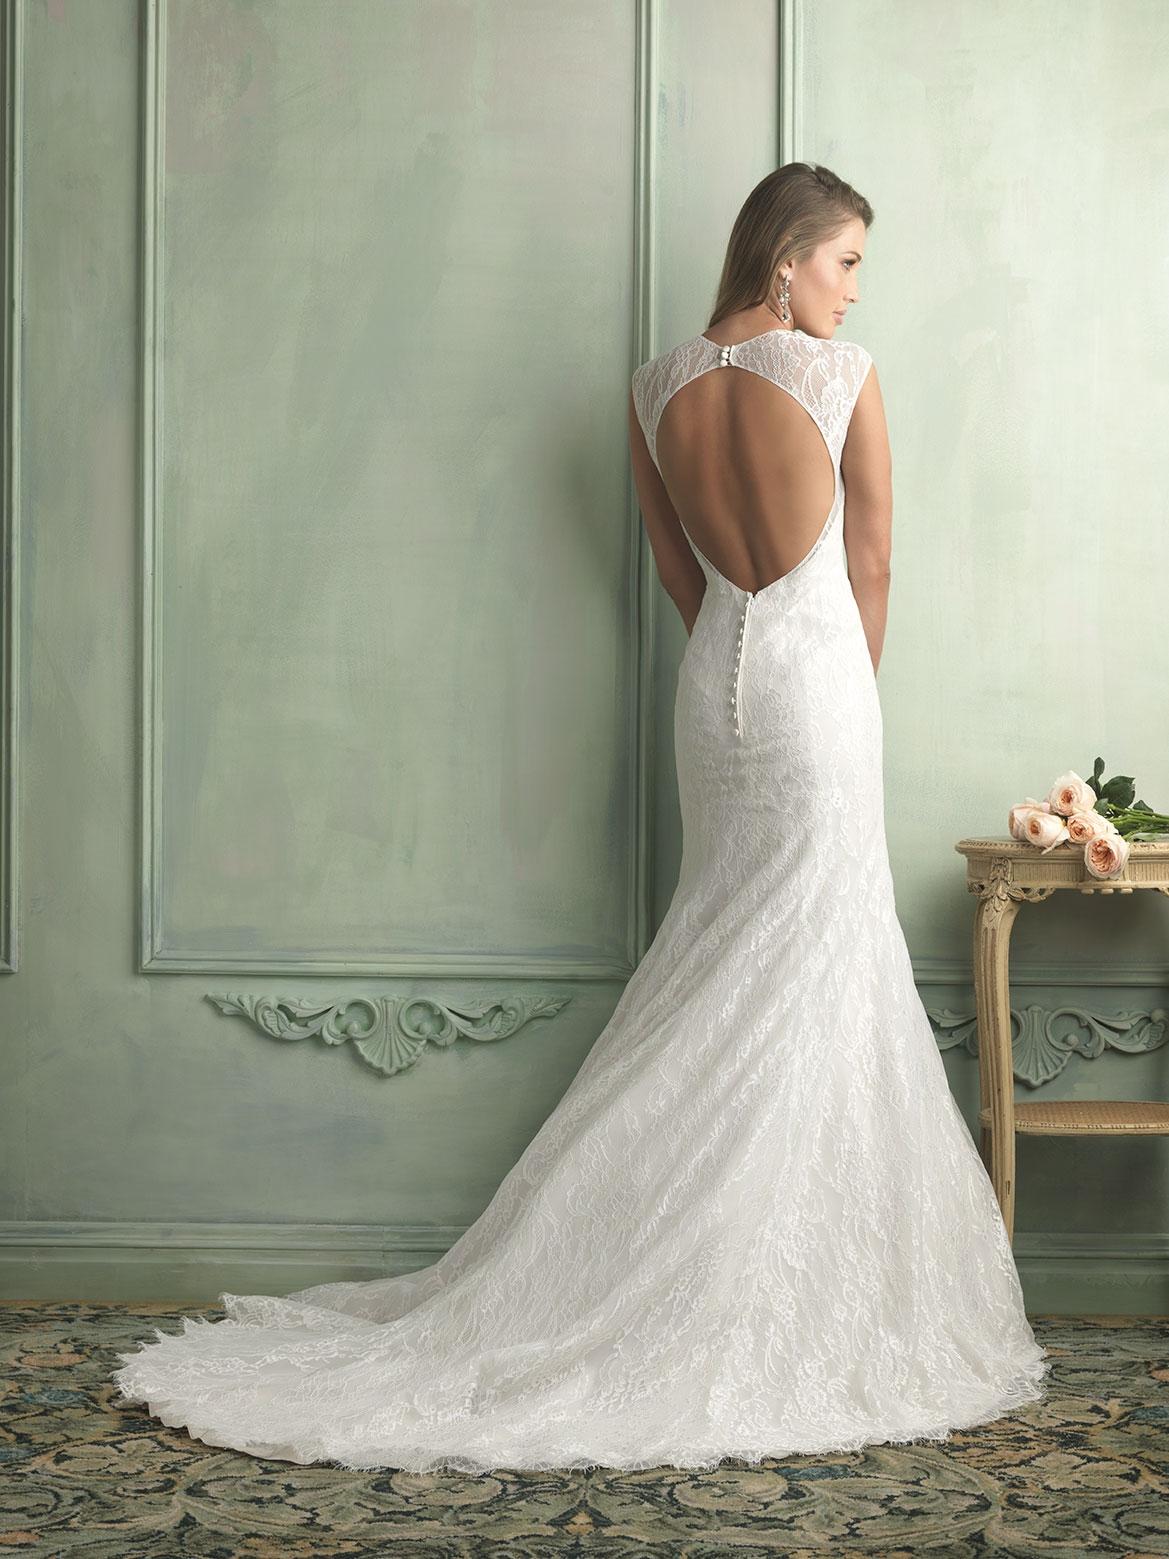 Vera-Wang-Backless-Wedding-Dresses-And-Gowns-2014 - Dream Irish Wedding